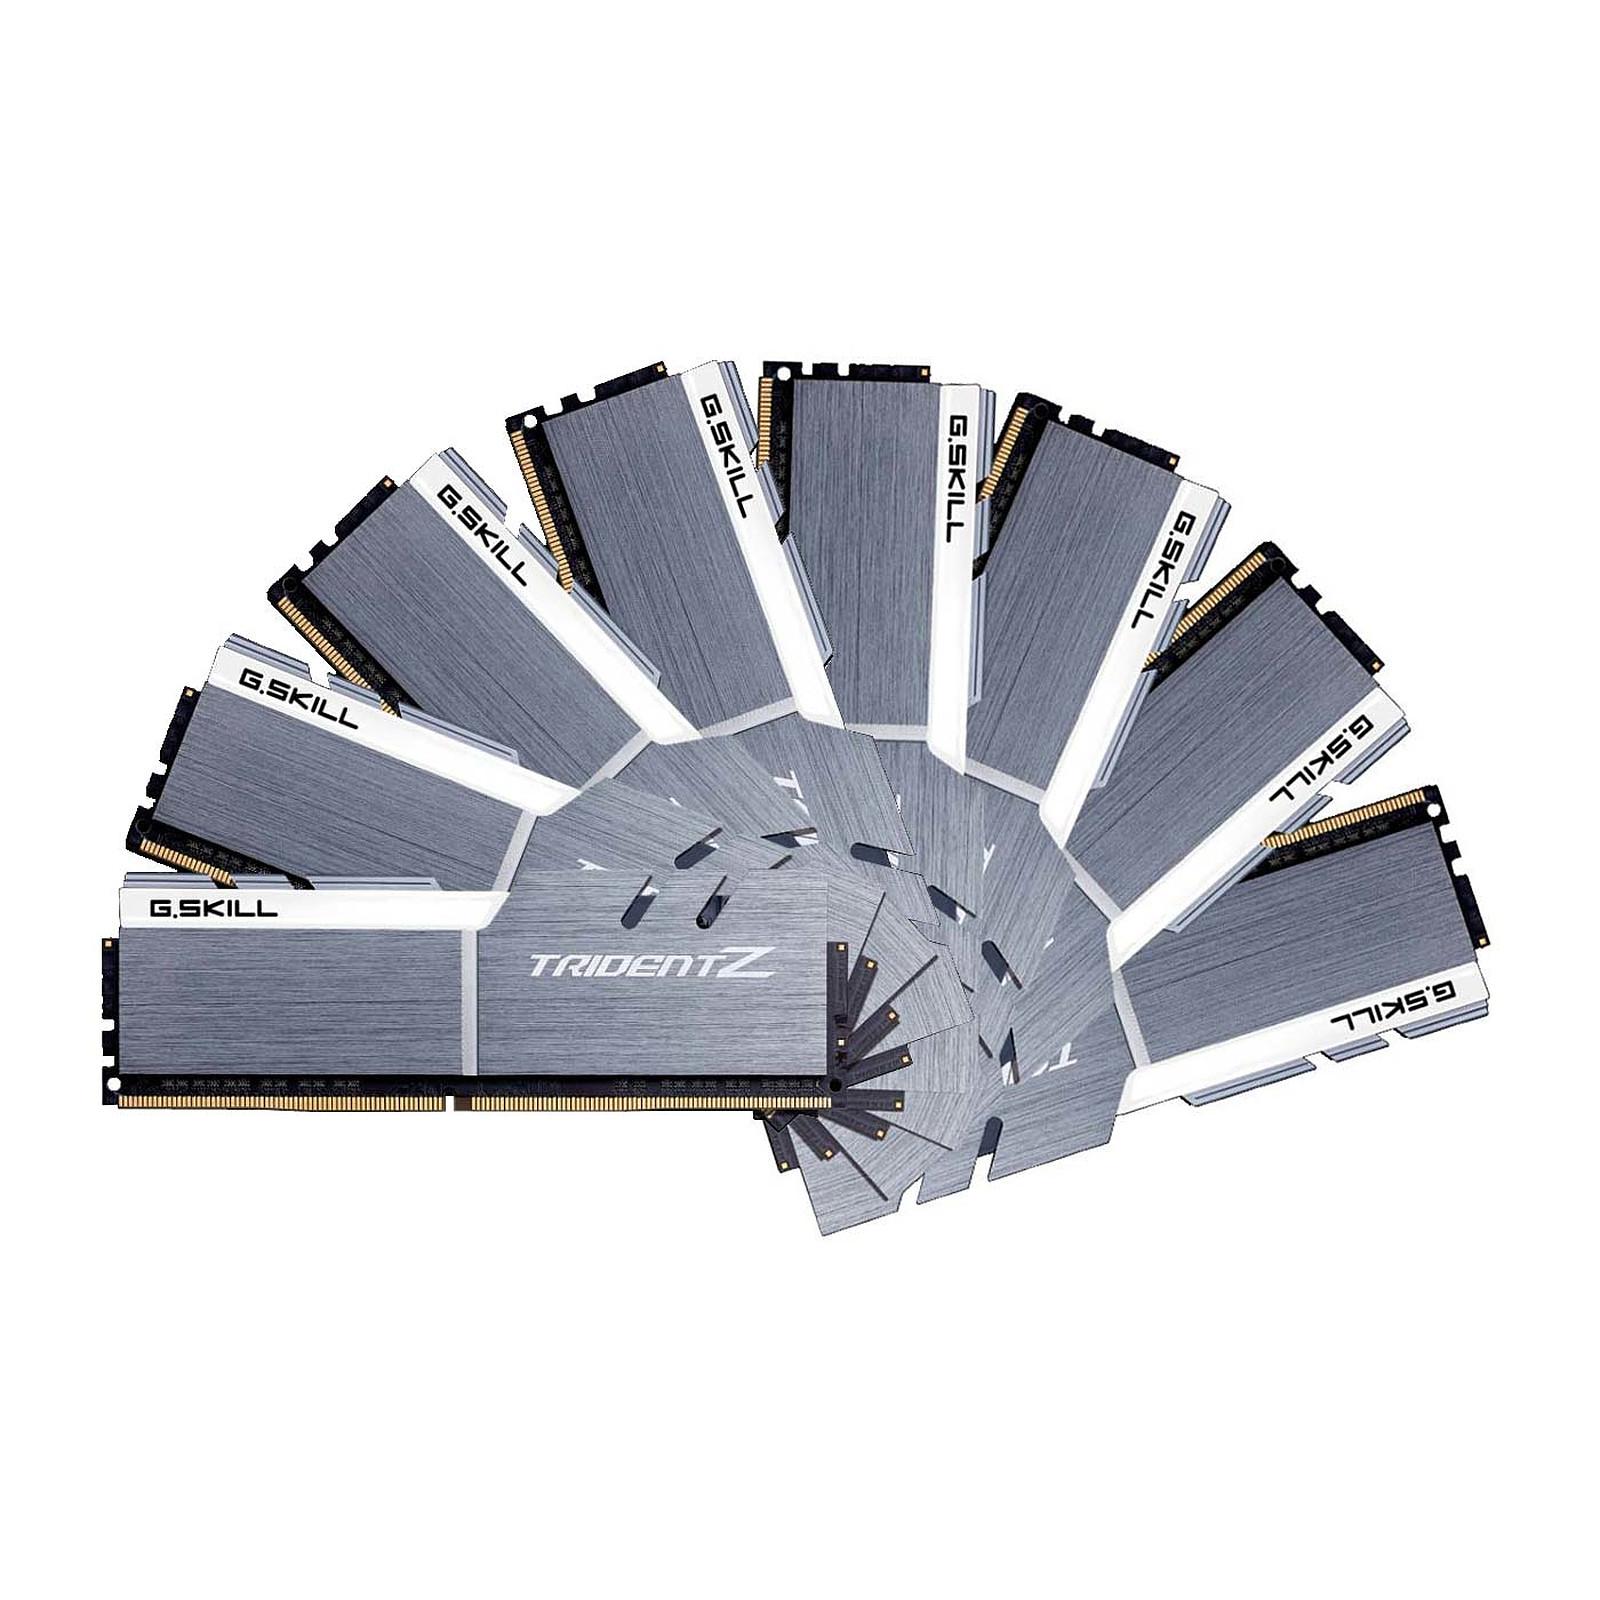 G.Skill Trident Z 64 Go (8x 8 Go) DDR4 3600 MHz CL16